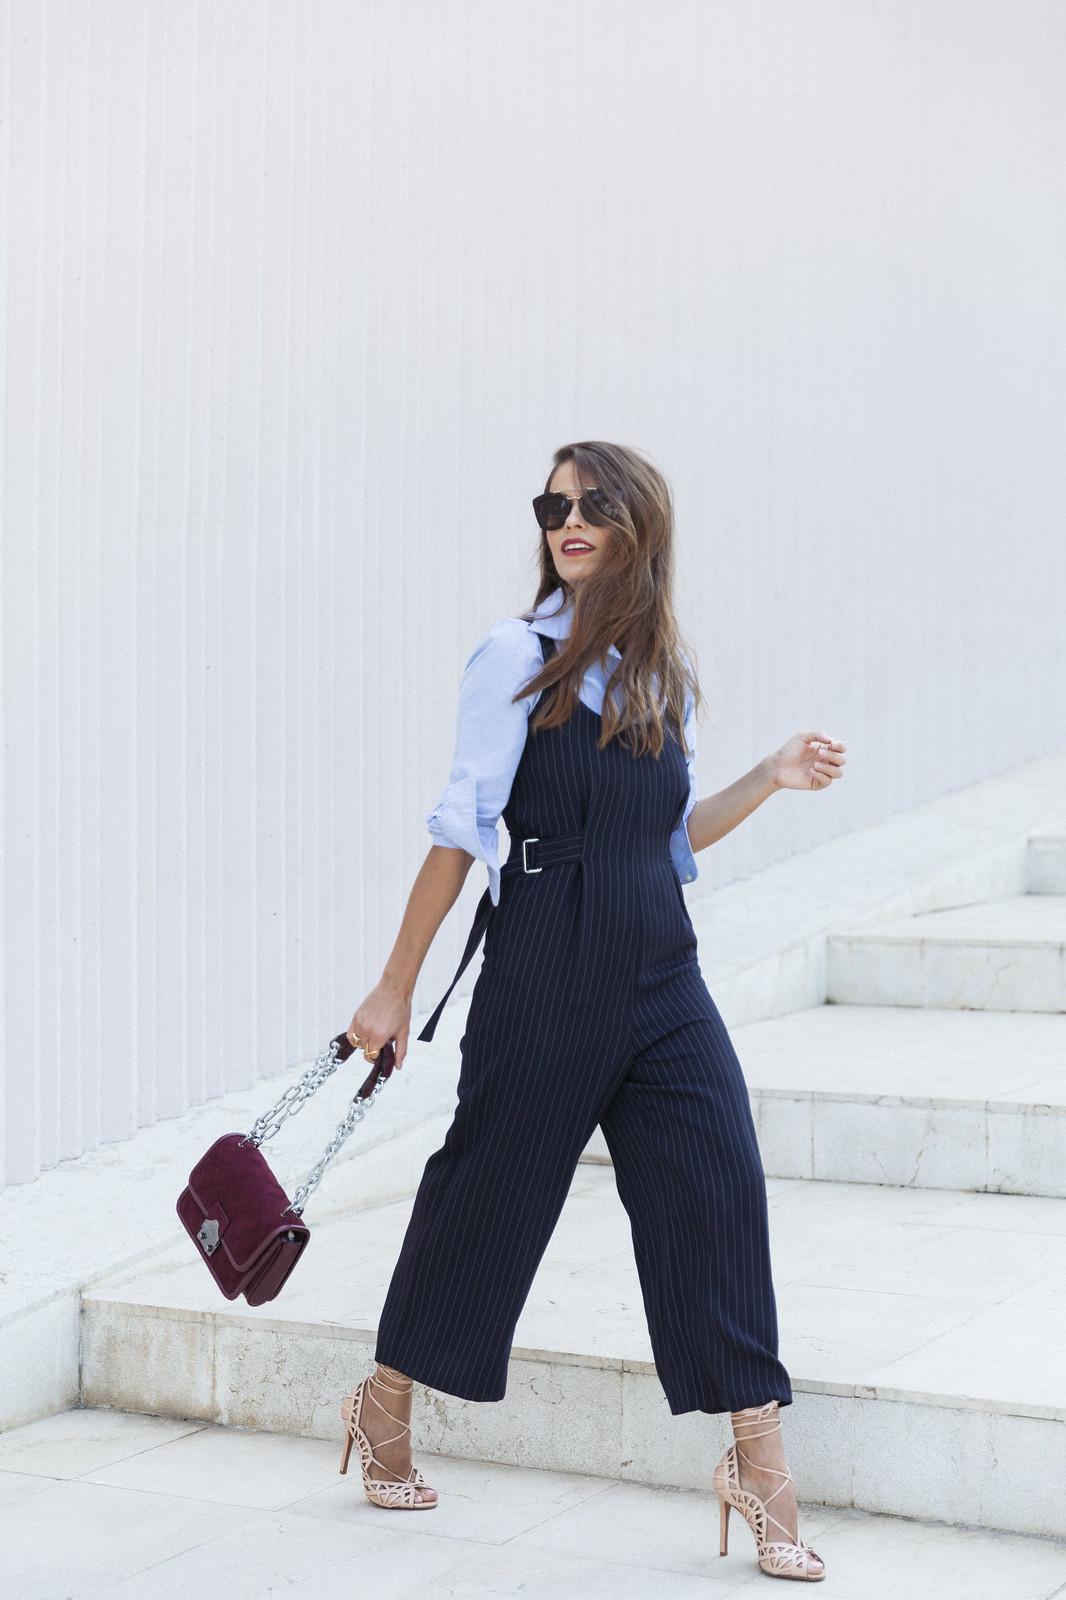 Jessie Chanes Seams for a desire - Pinstripped suit topshop heeled sandals schutz parfois bag  -12